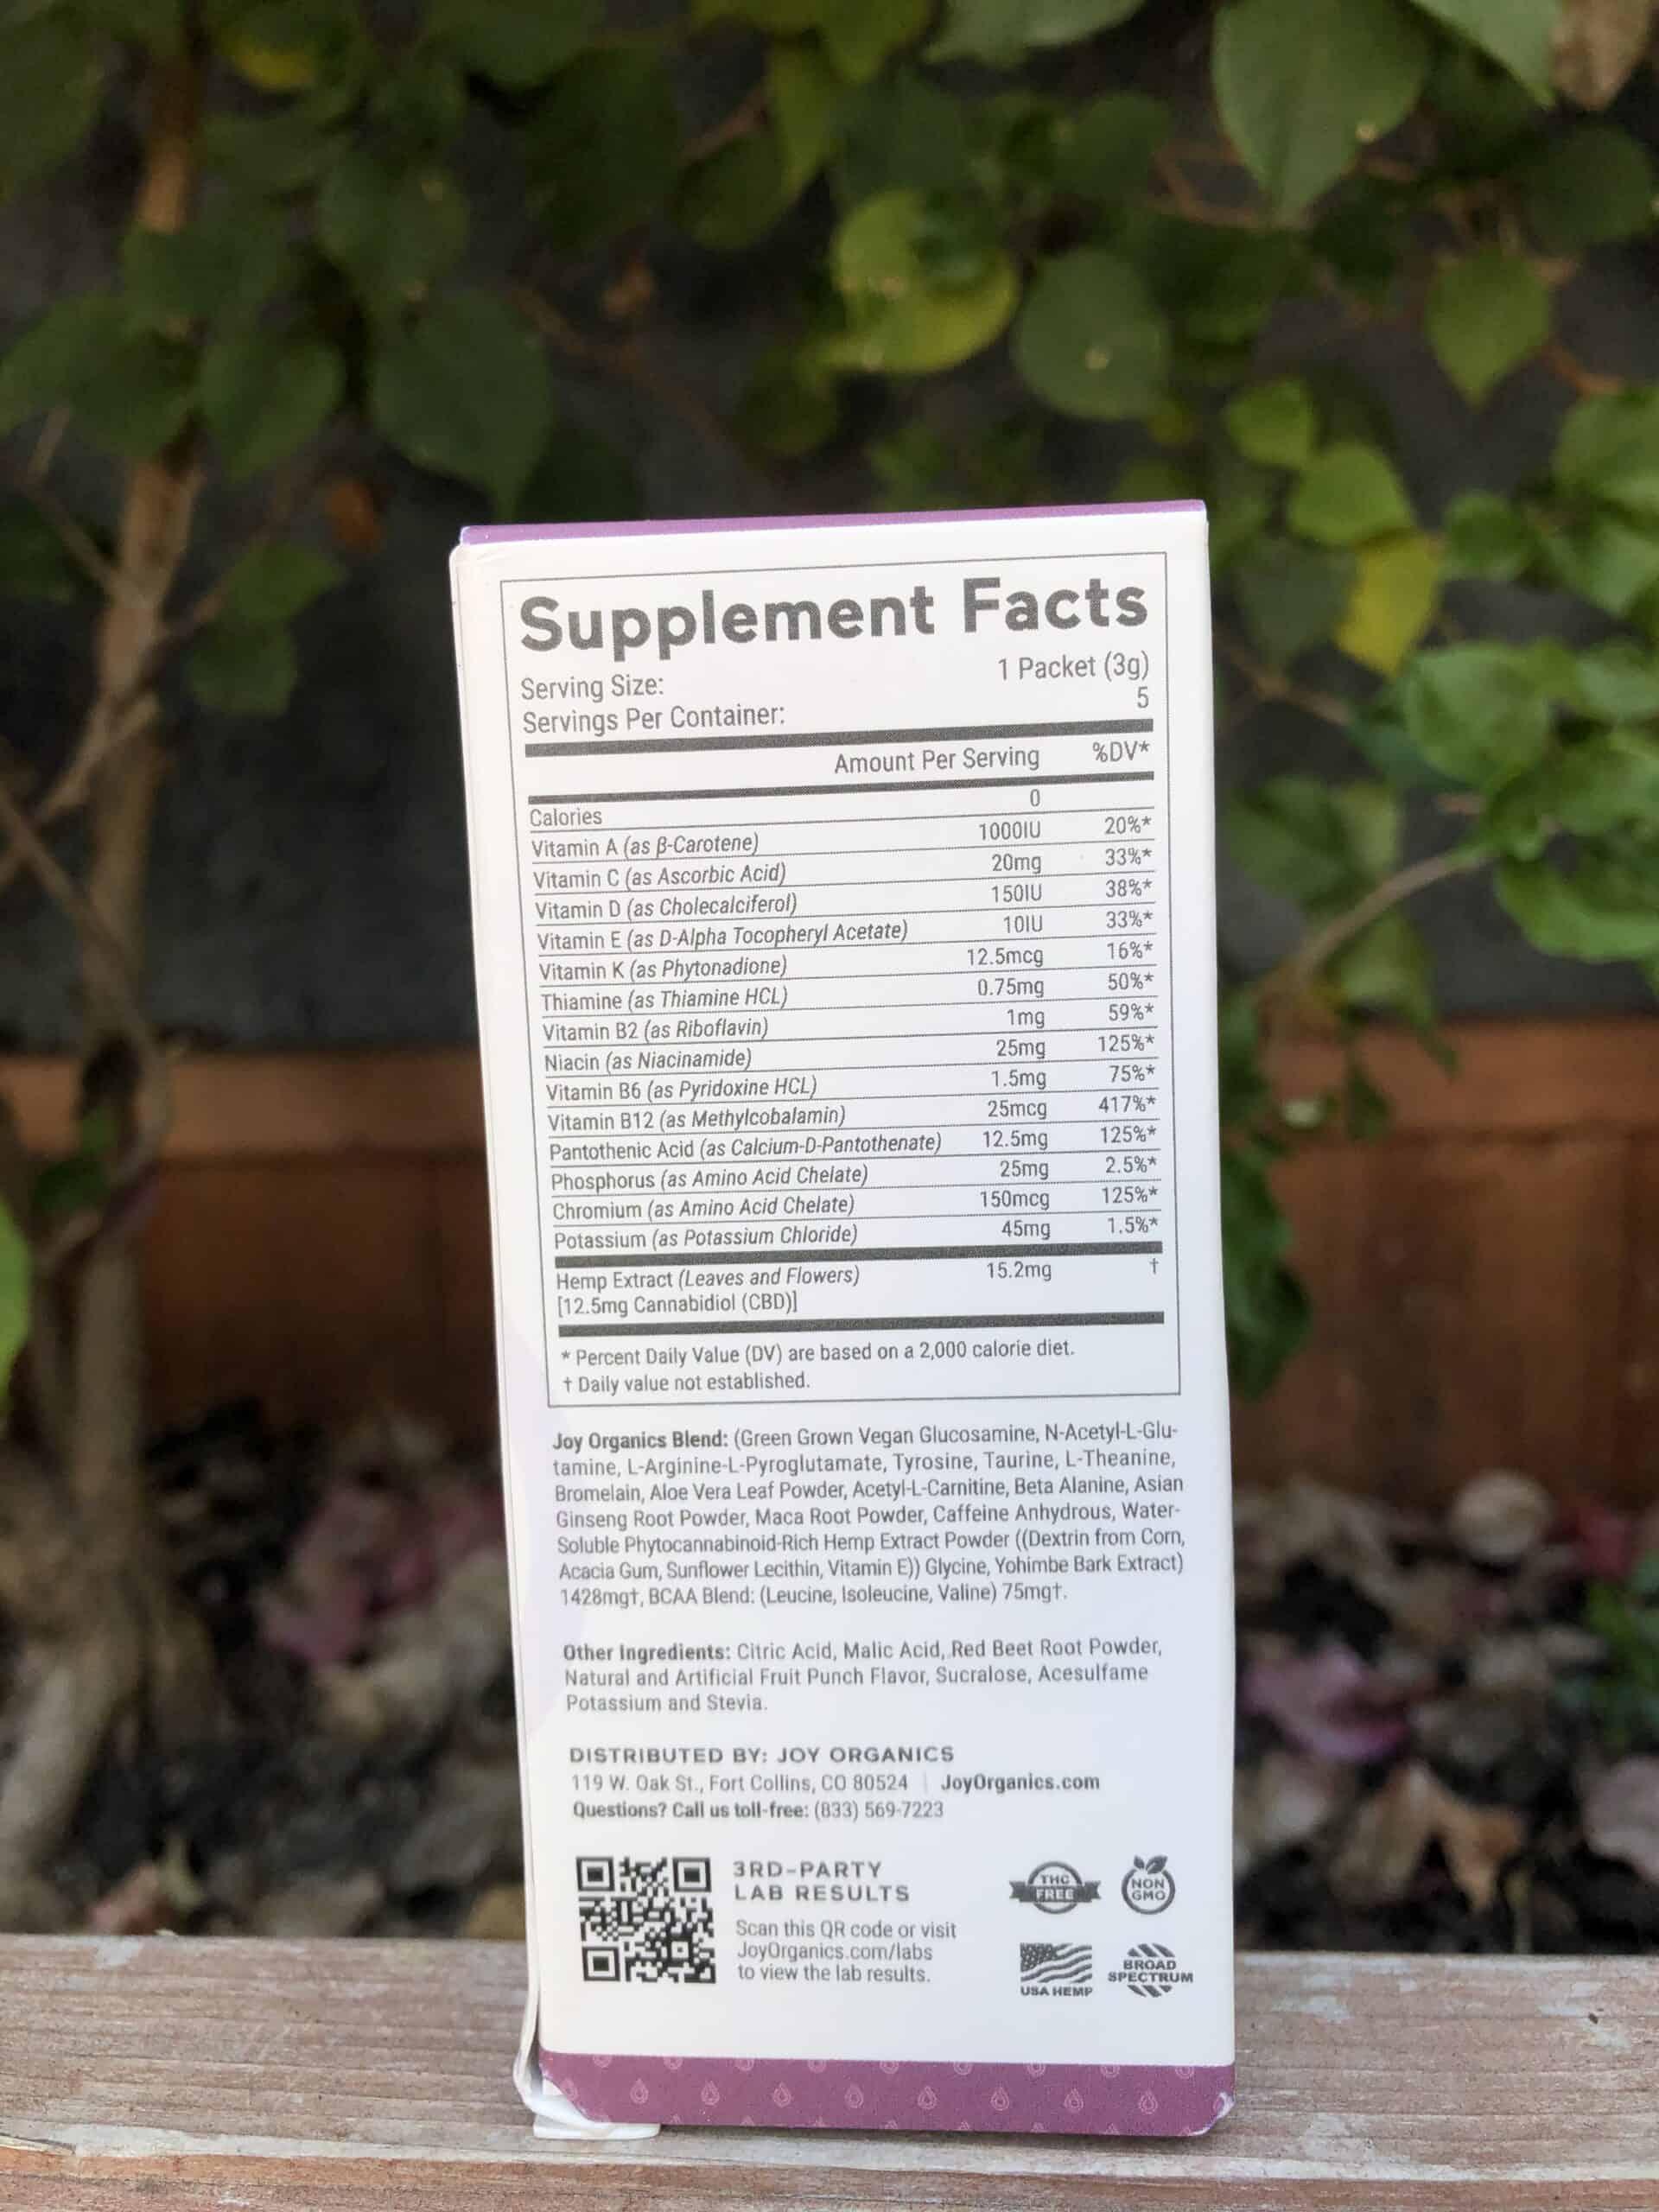 joy organics cbd energy drink all premium cbd com save on cannabis review specifications